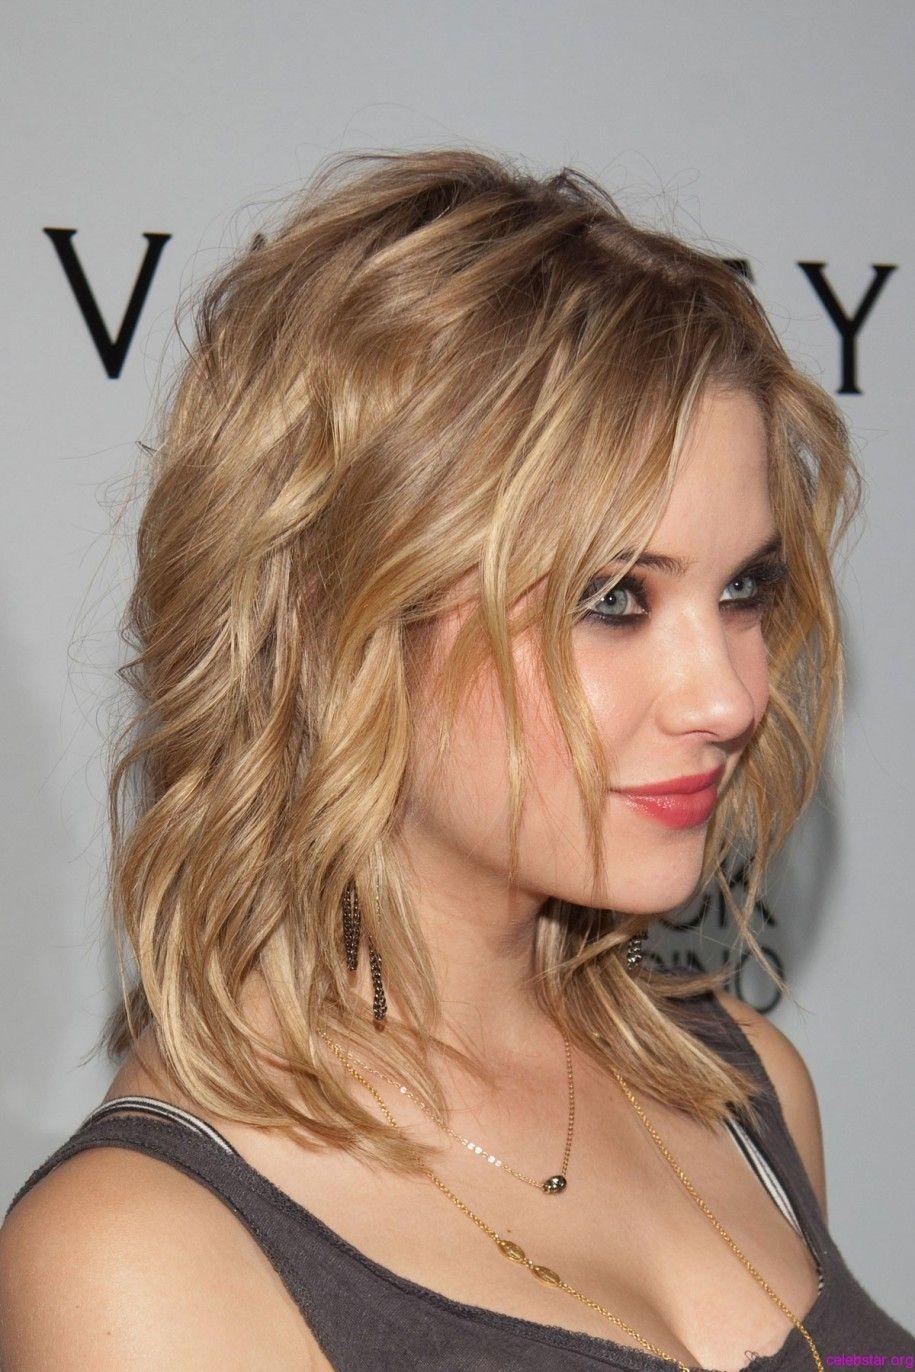 ashley benson hairstyle - short hair style | cɛʟєɞяıтʏ ʜɑıя